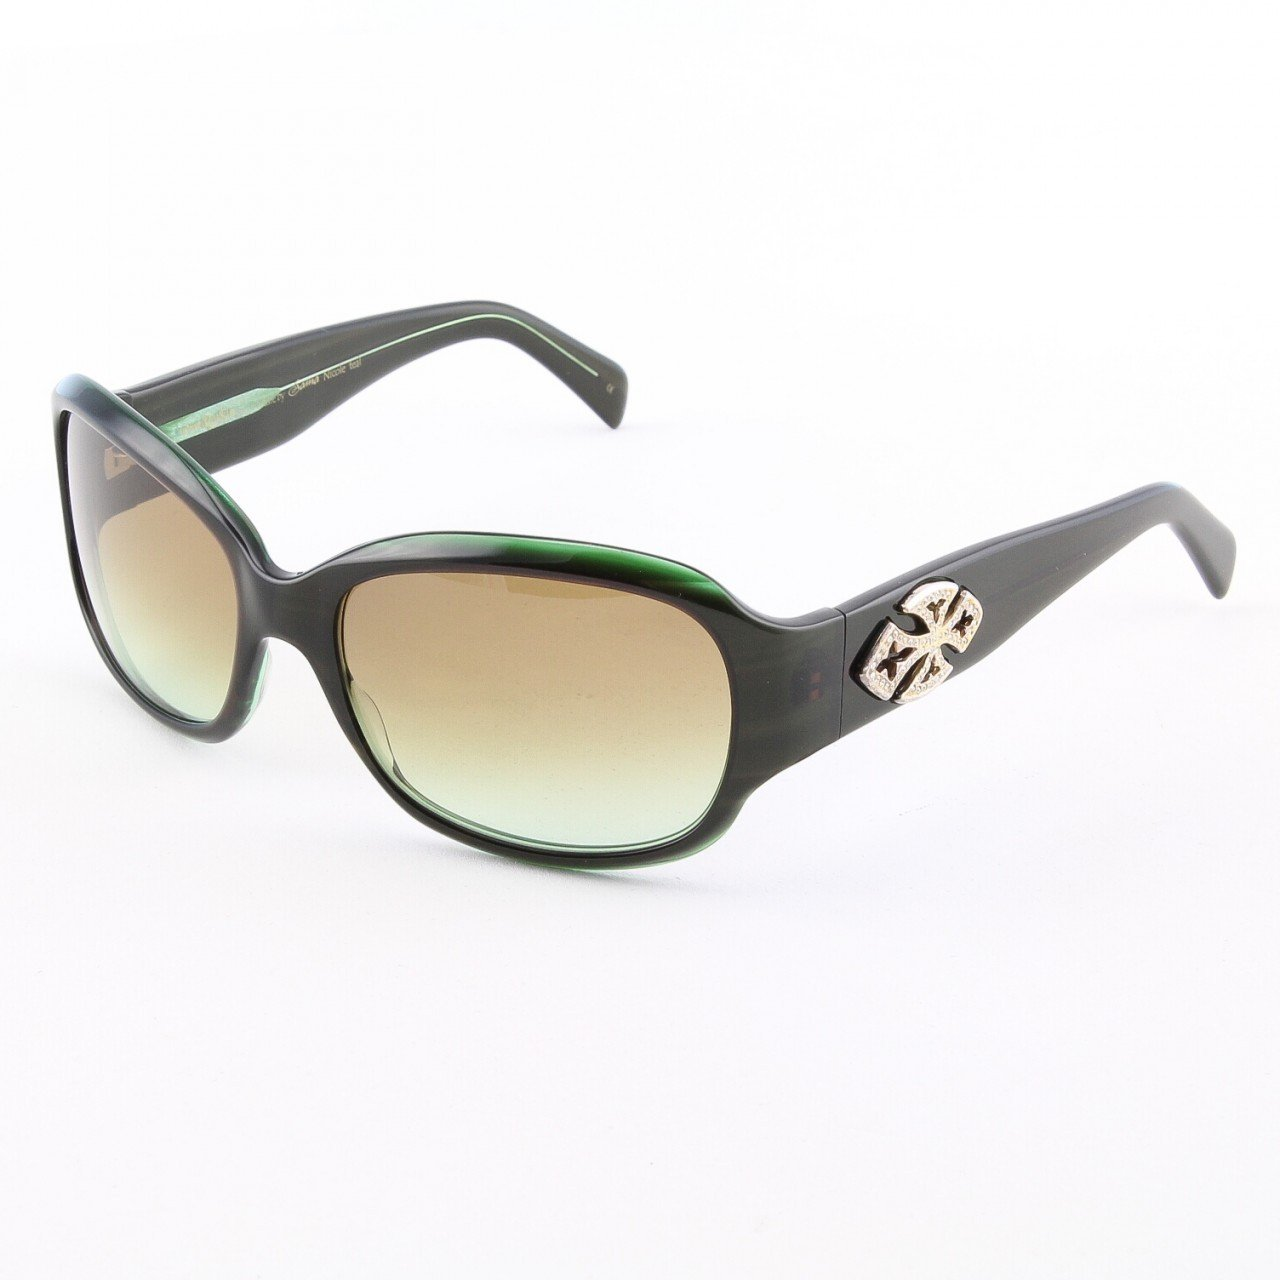 Loree Rodkin Nicole Sunglasses Teal w/ Brown Gradient Lenses, Sterling Silver, Swarovski Crystals